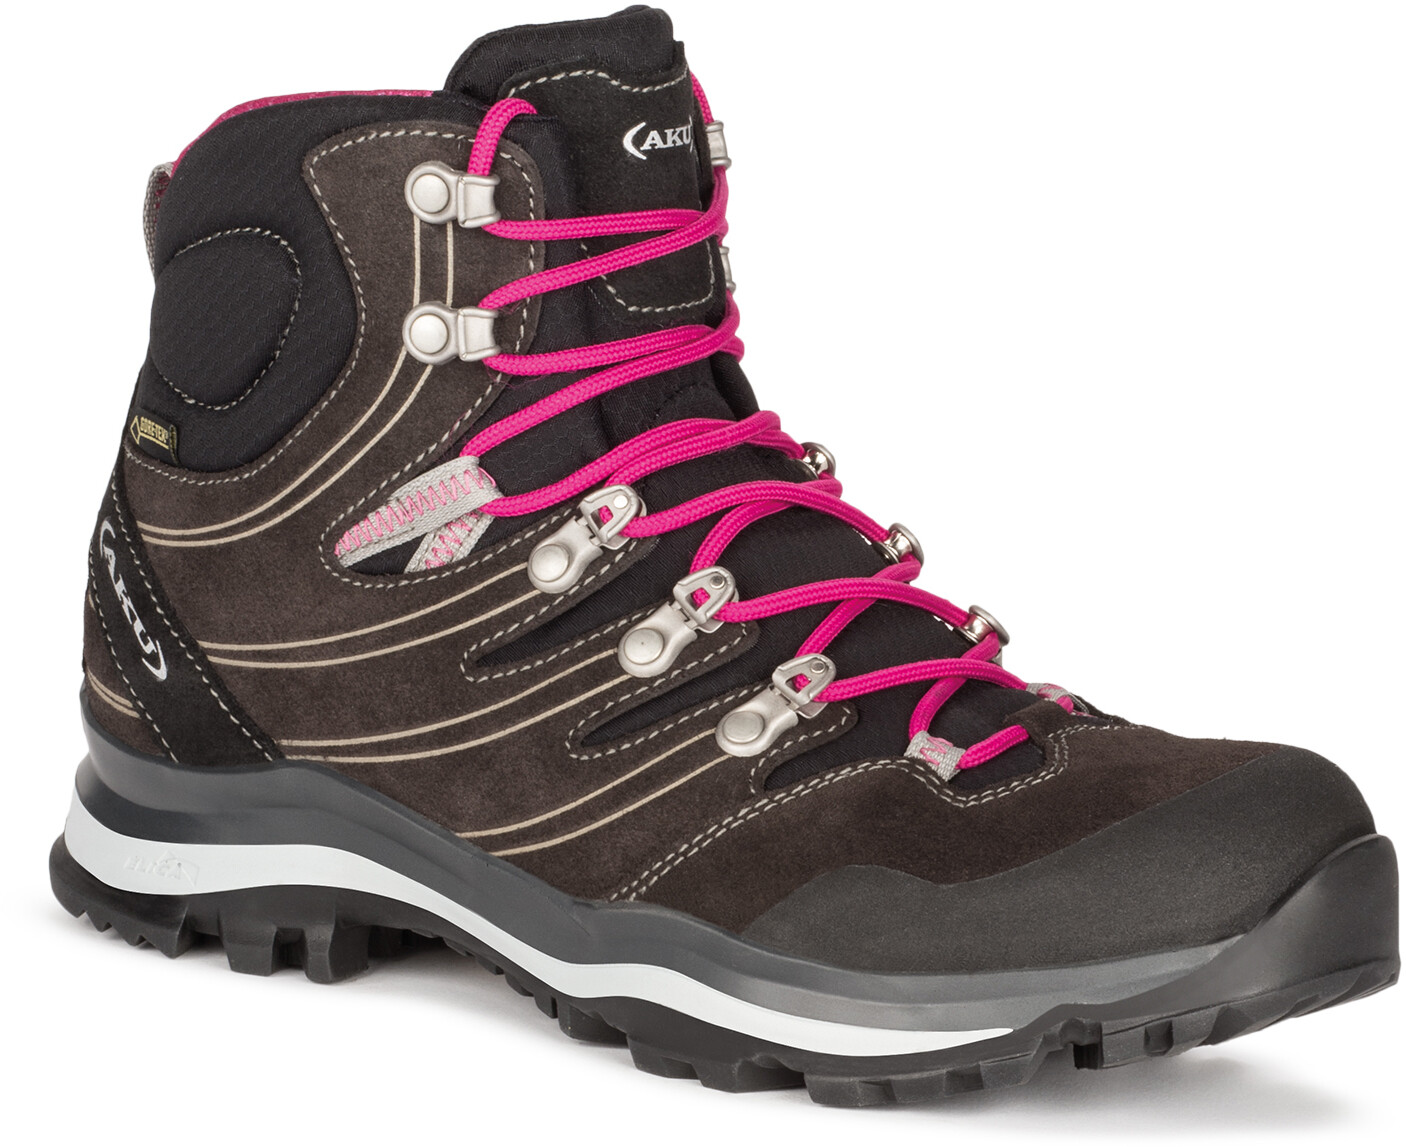 Women Alterra Gtx Anthracite Shoes Aku Magenta j3R54AL